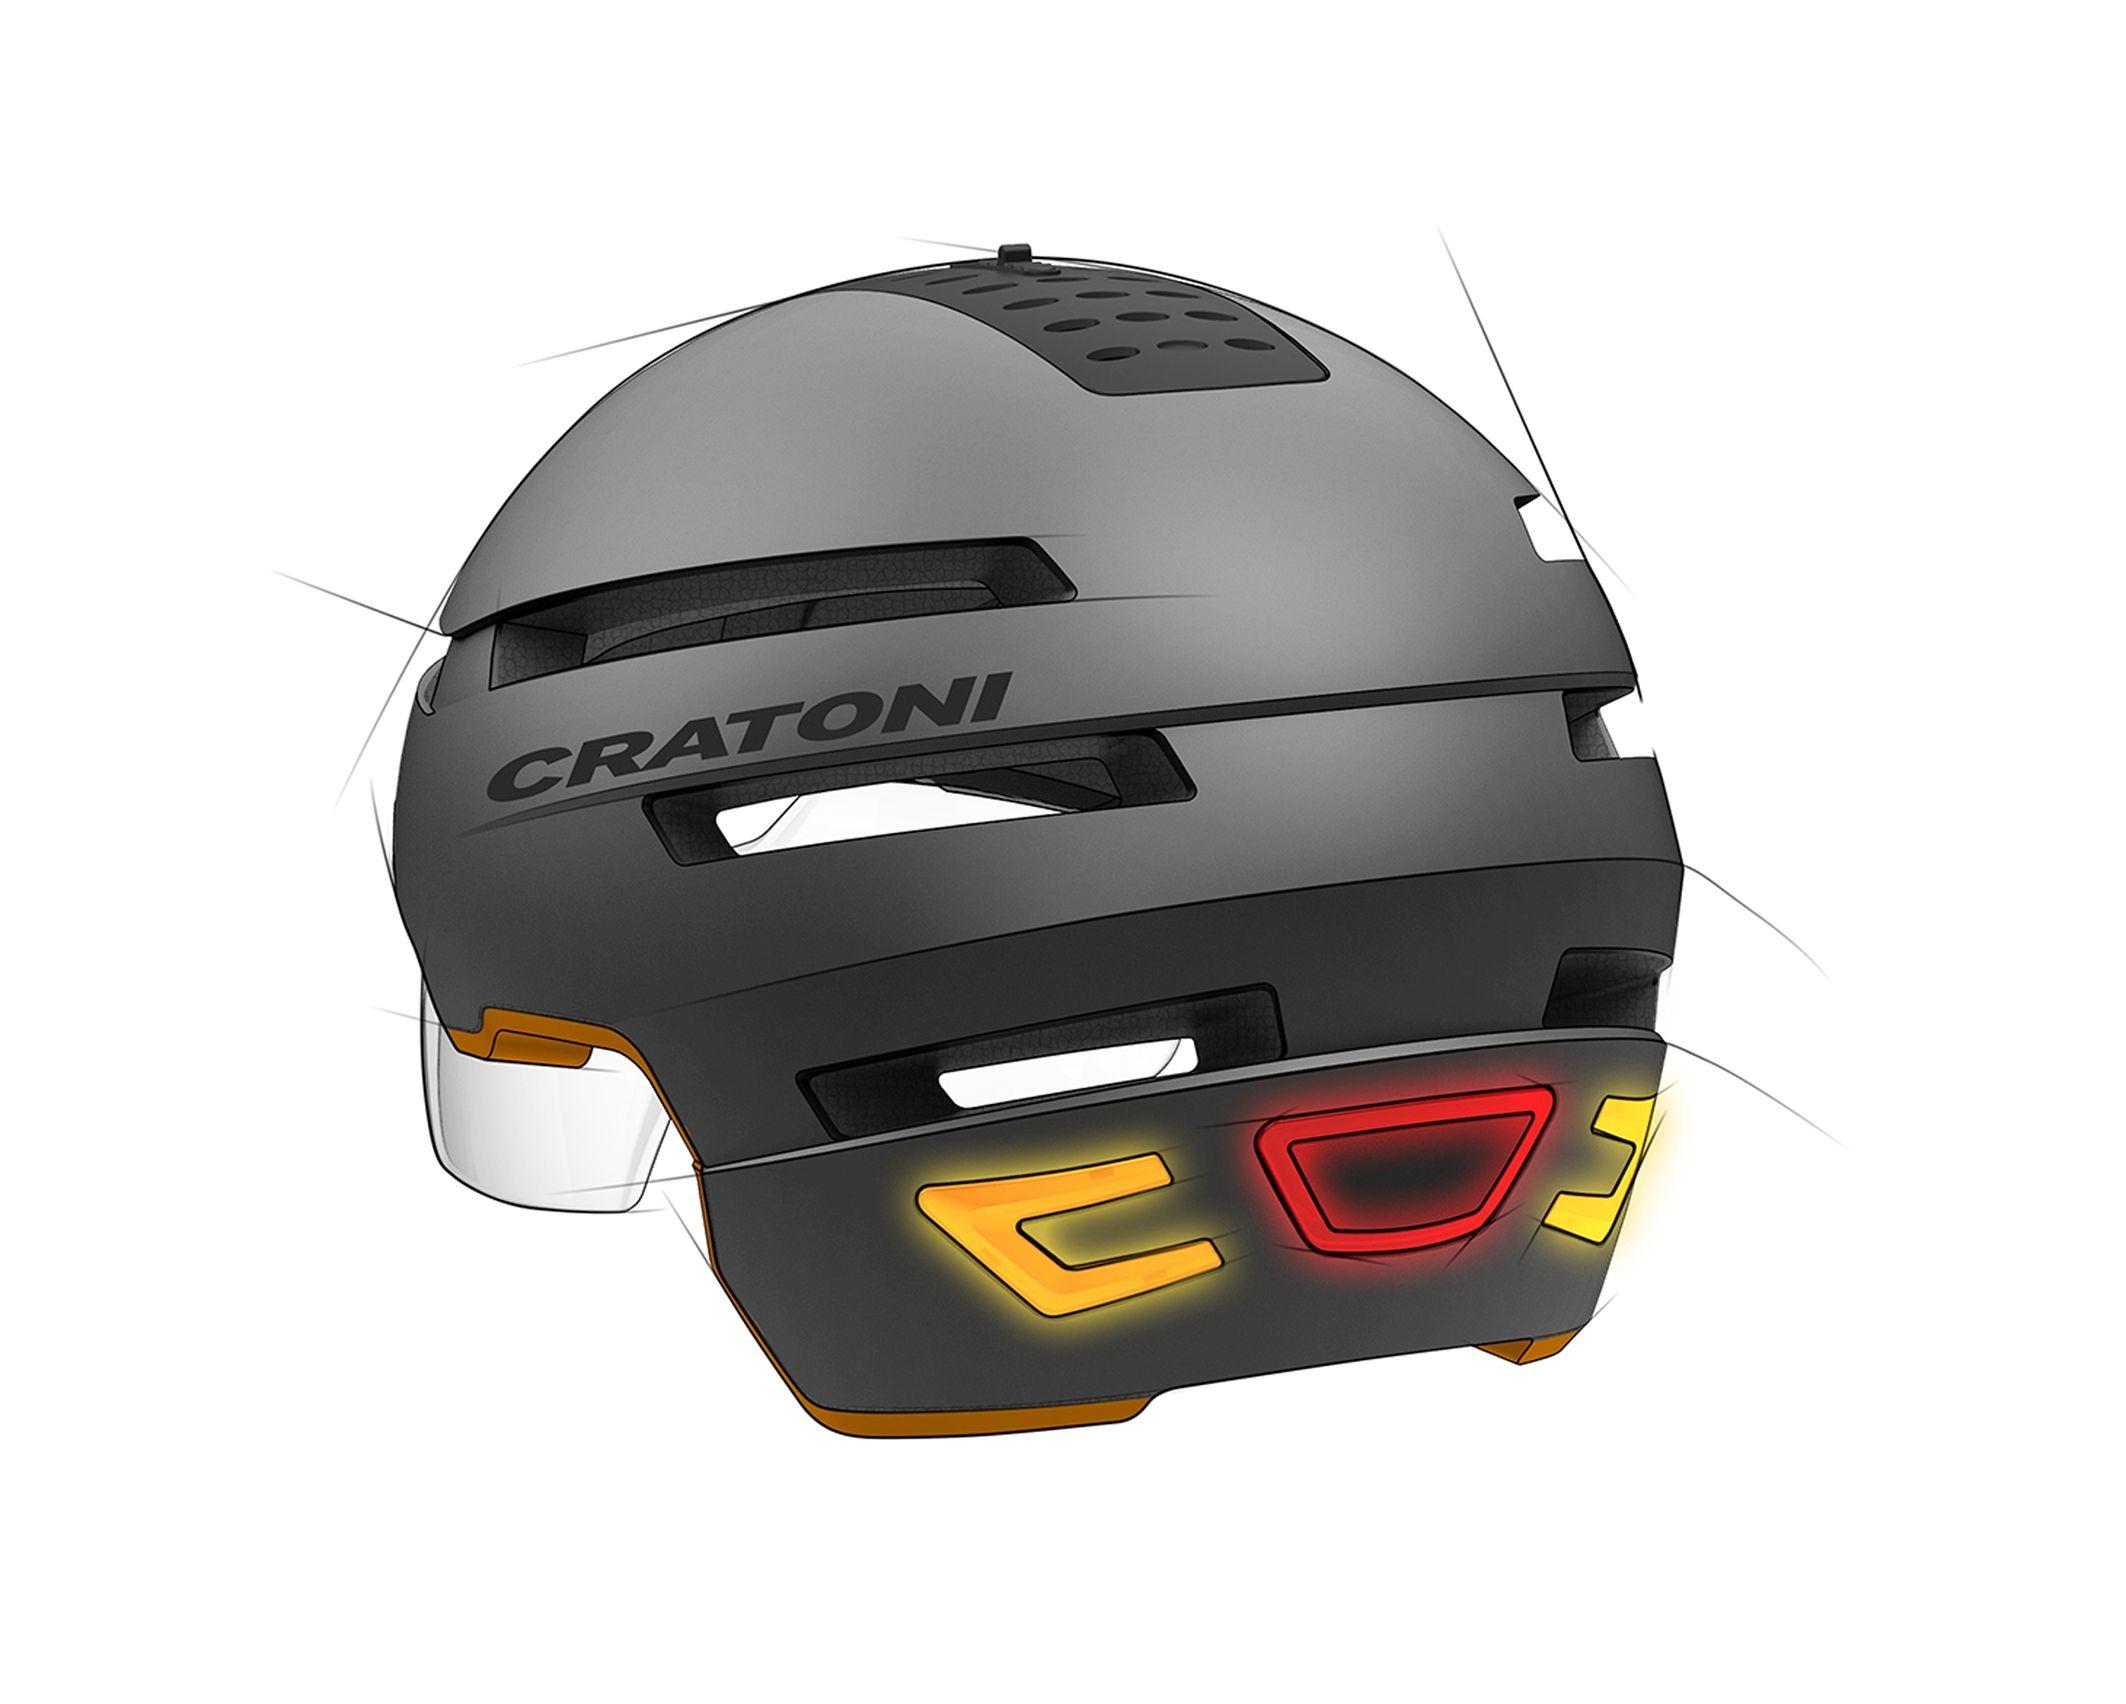 Cratoni C 94 Der Smarte Fahrradhelm Bei Elektrobike